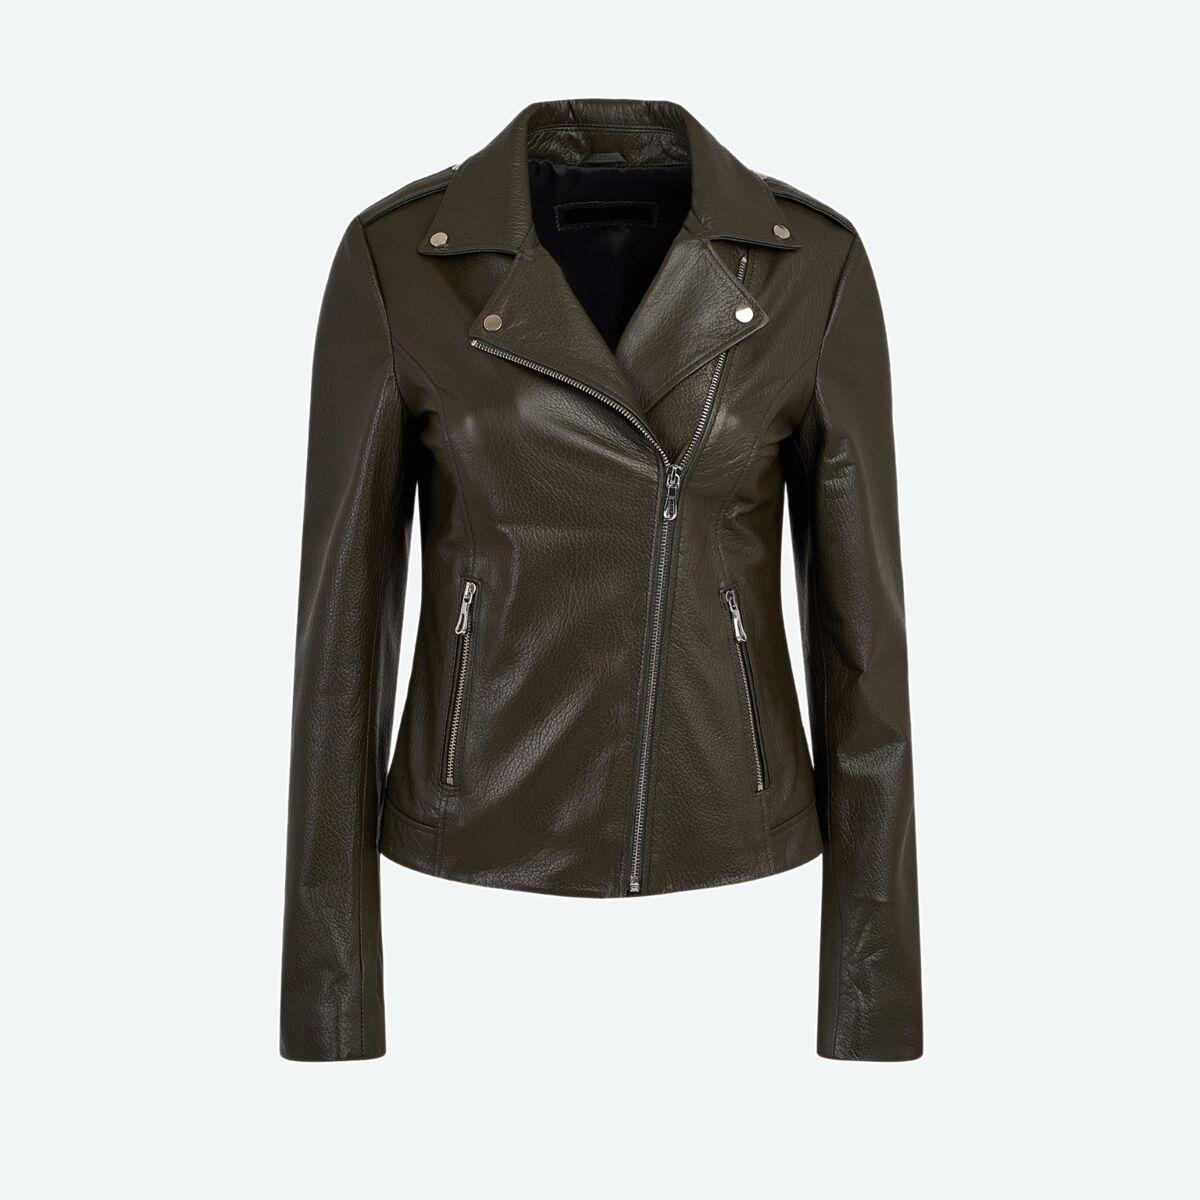 Women's Classic Biker Jacket - Olive Green